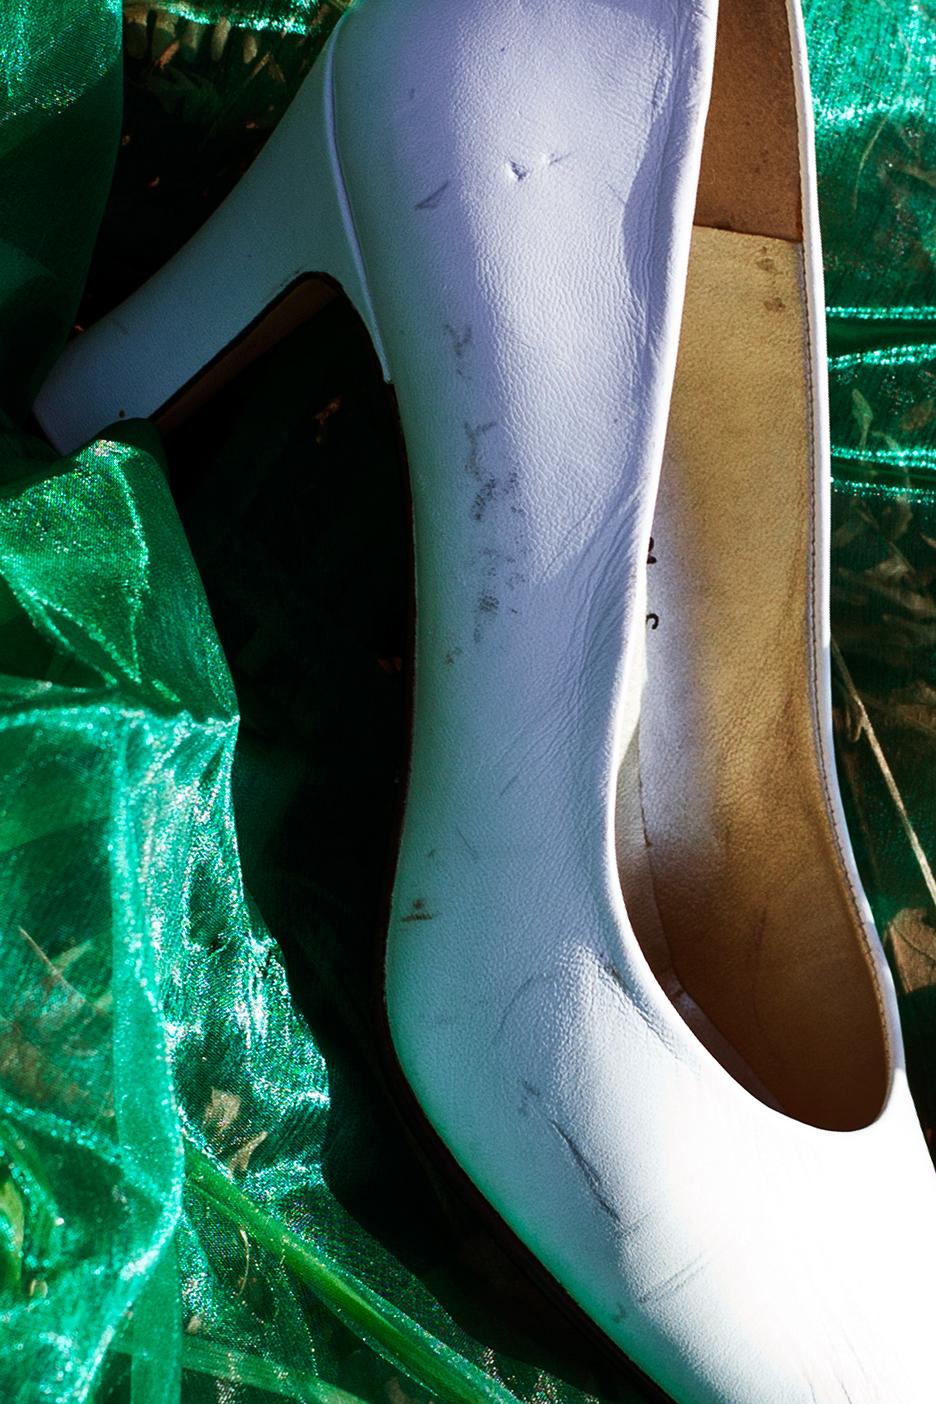 damaged-stiletto-by-ransom-ashley-.jpg